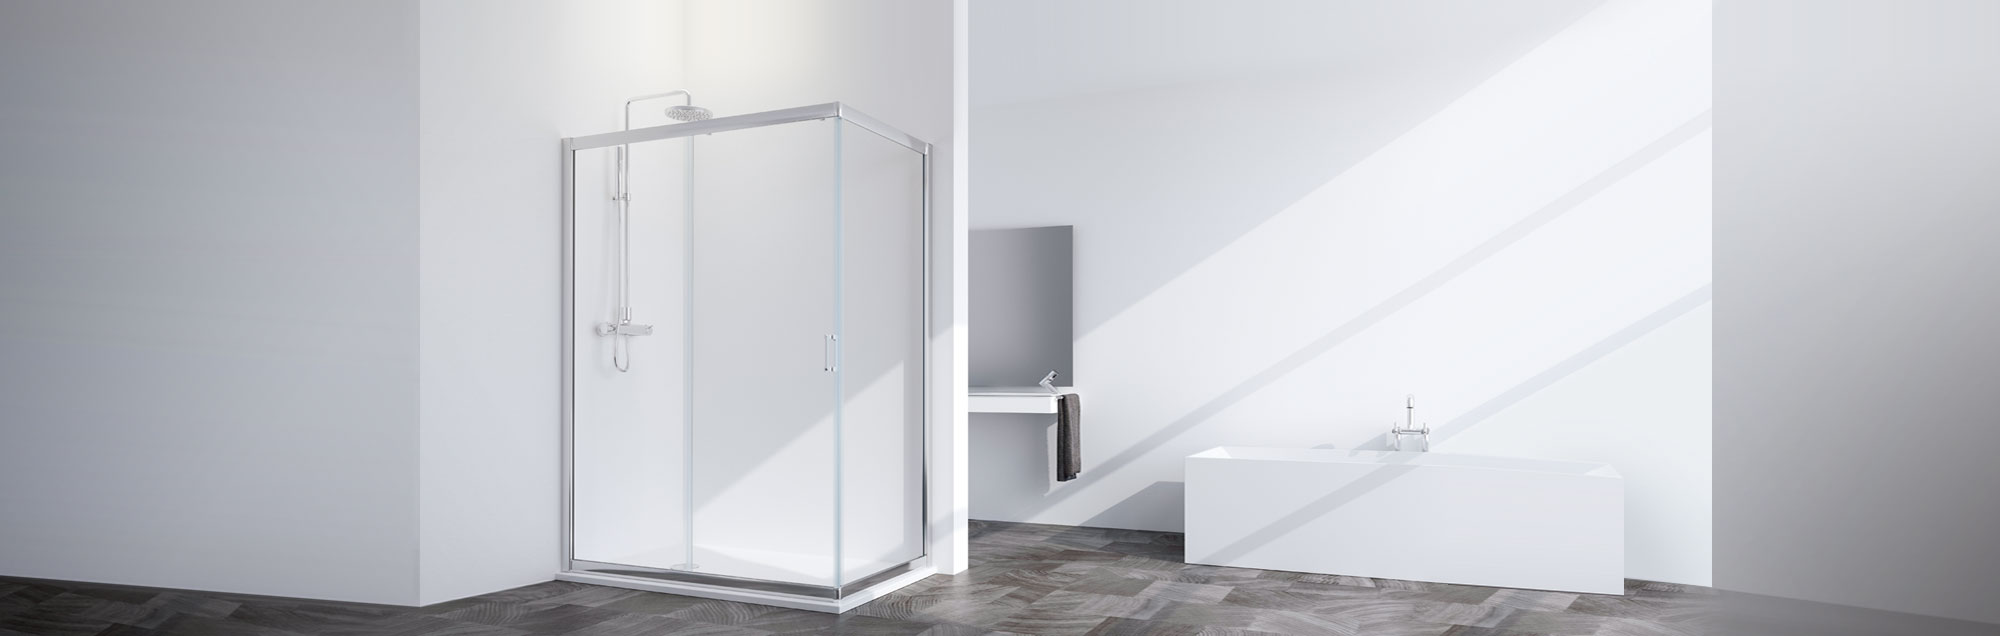 Mamparas standard de baño a medida PROFILTEK